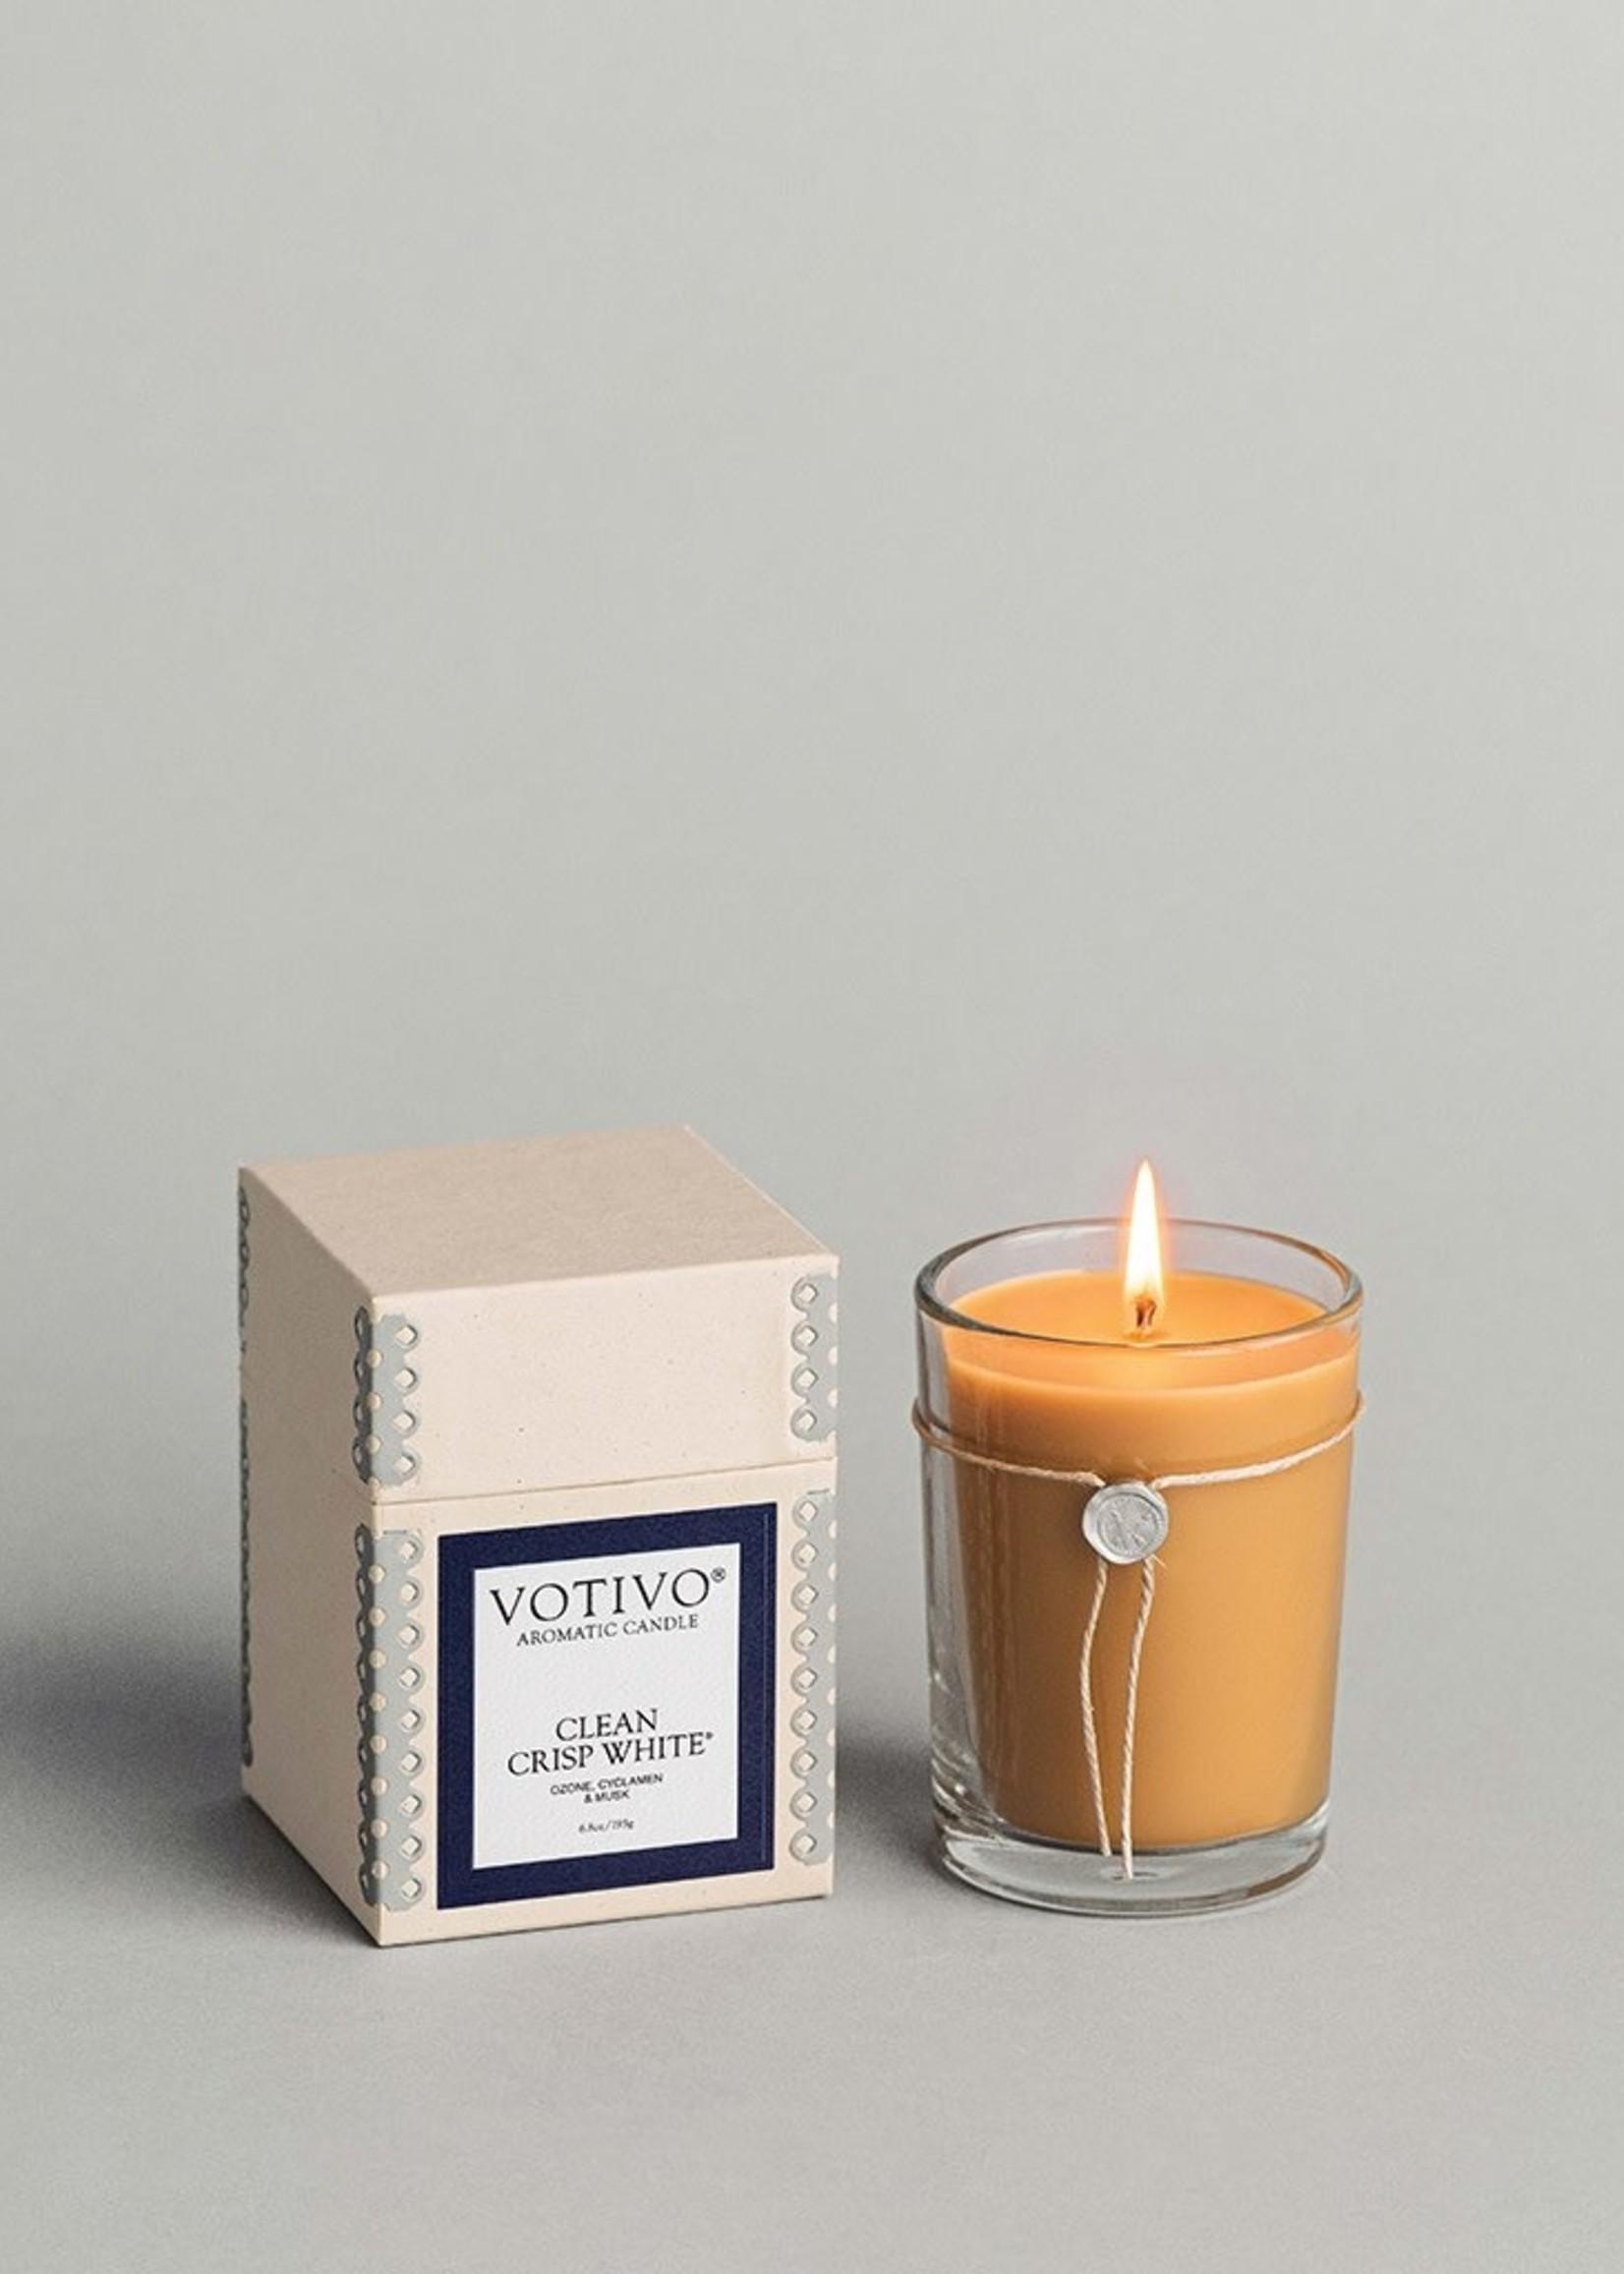 Votivo Aromatic Candle, 6.8oz